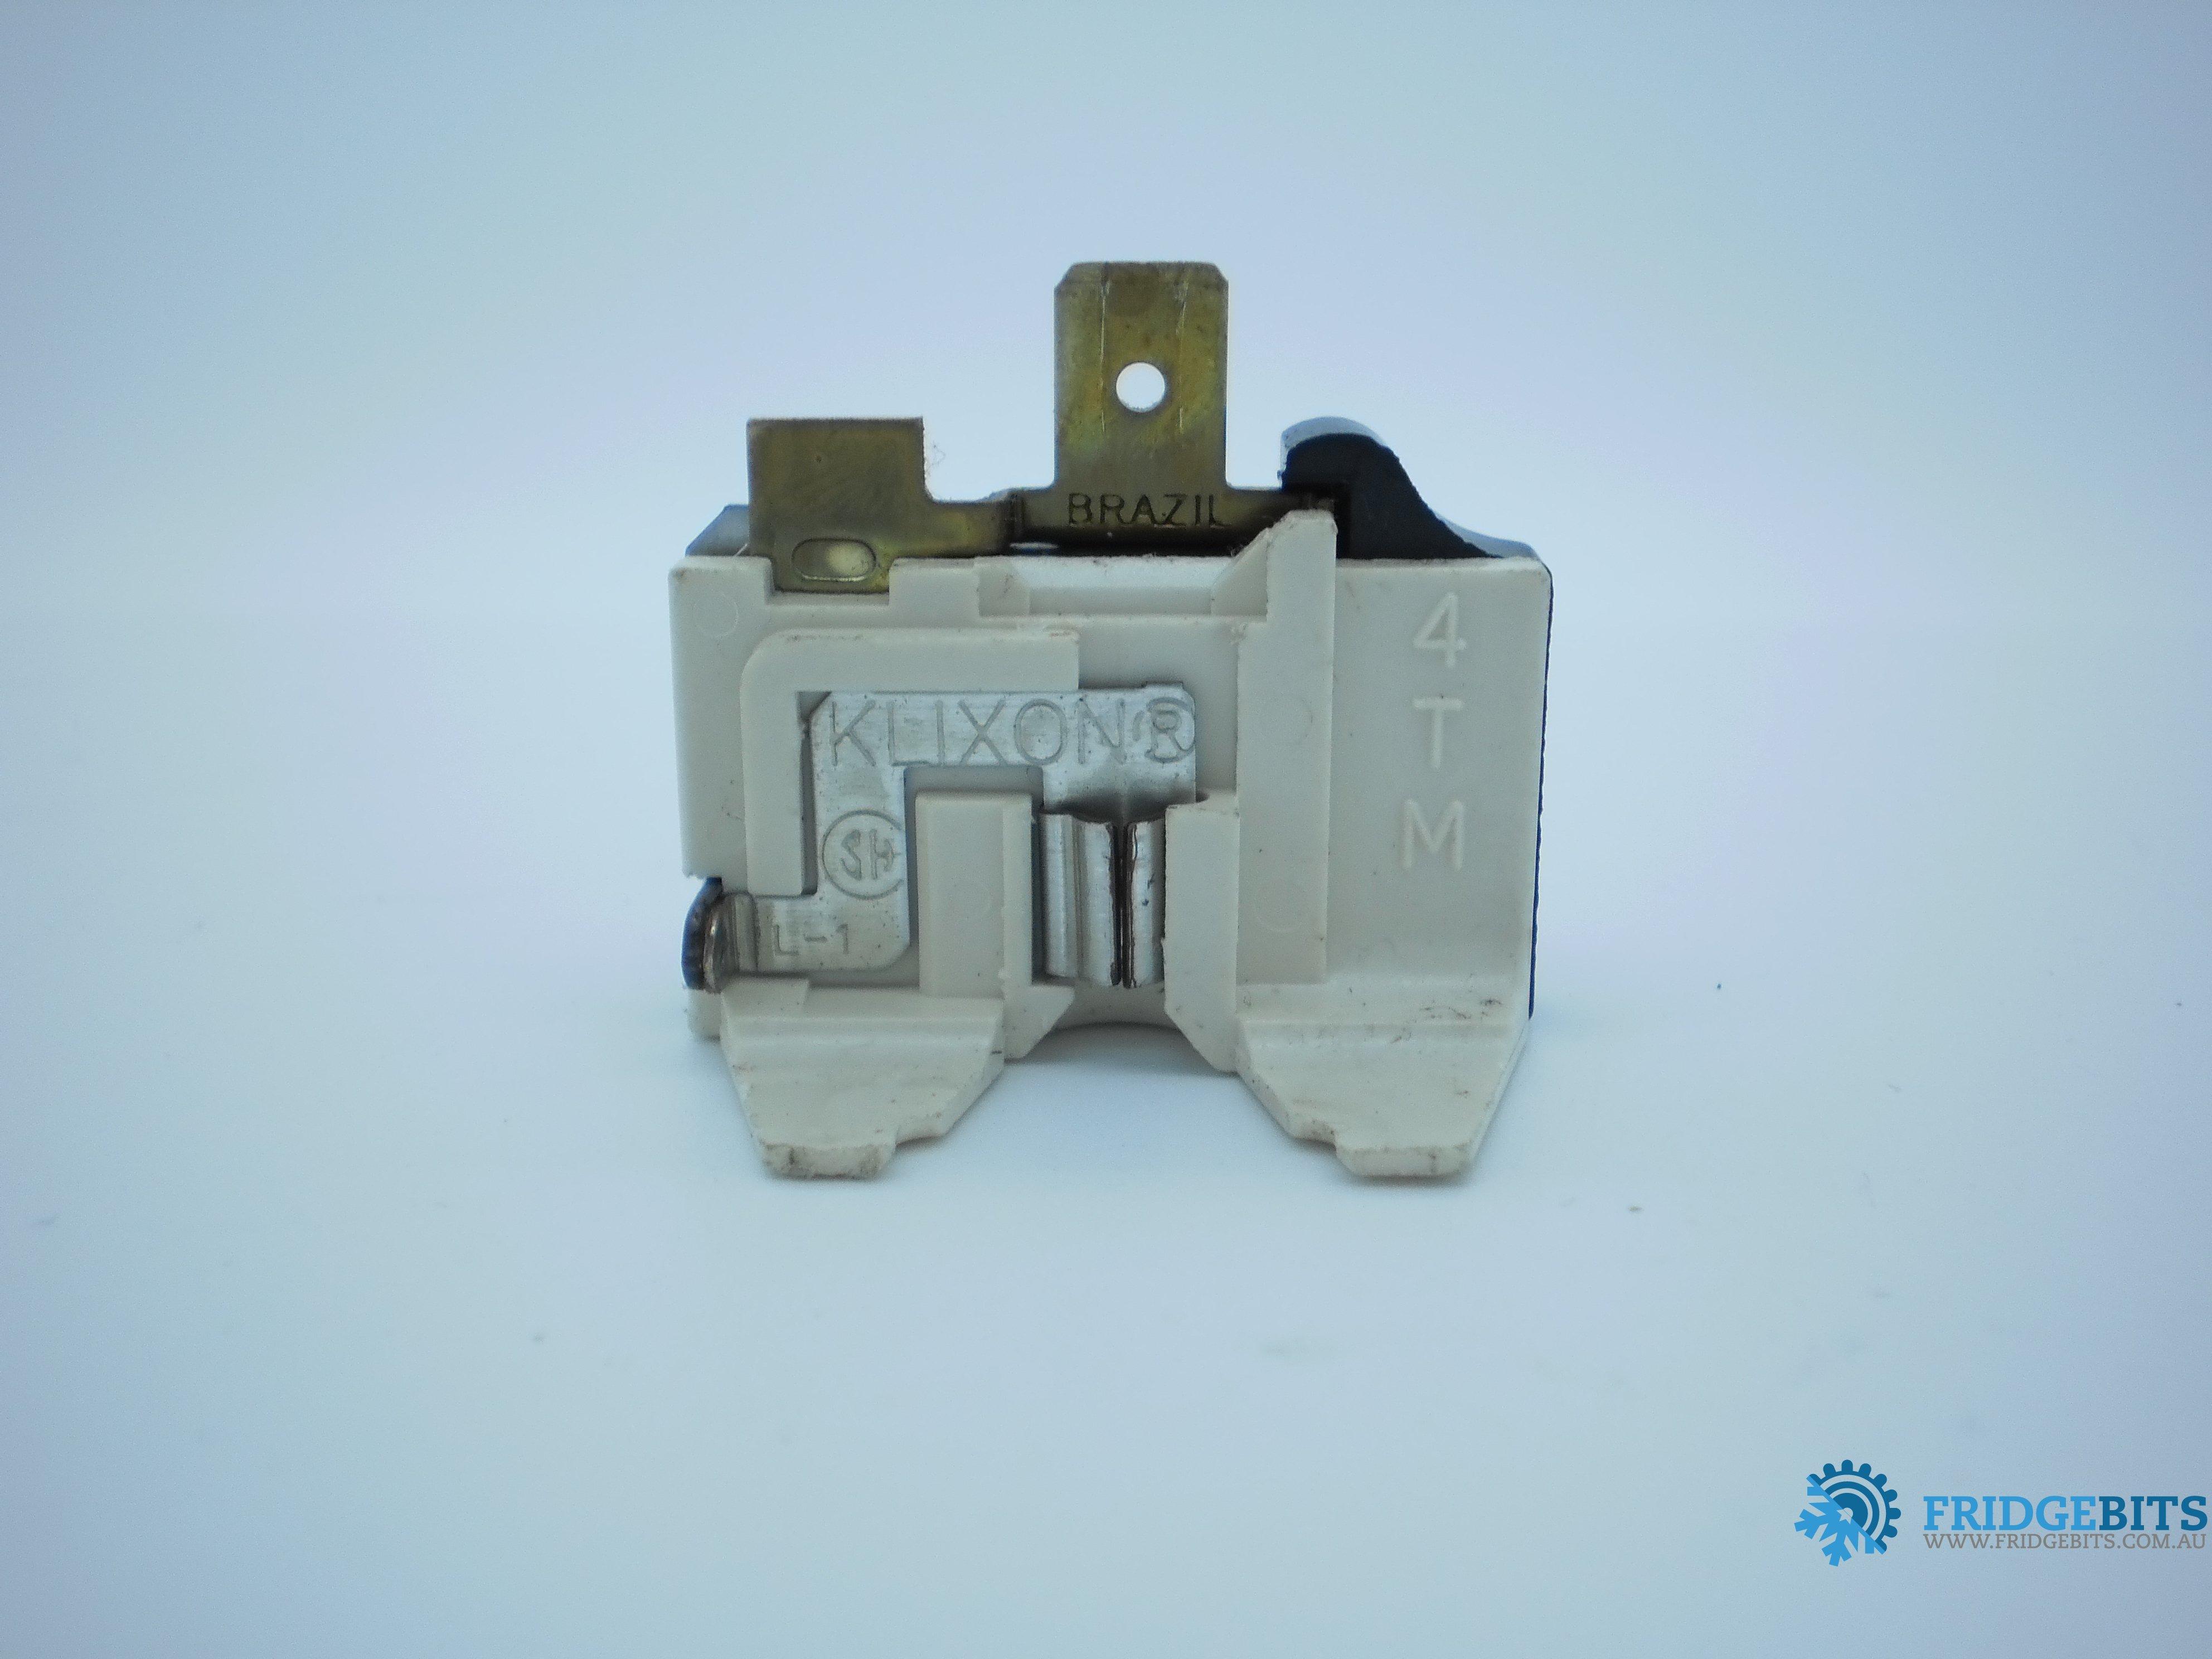 Ge Refrigerator Overload Relay Wiring Diagram Basic Guide Klixon Compressor Related Keywords Kenmore Run Haier